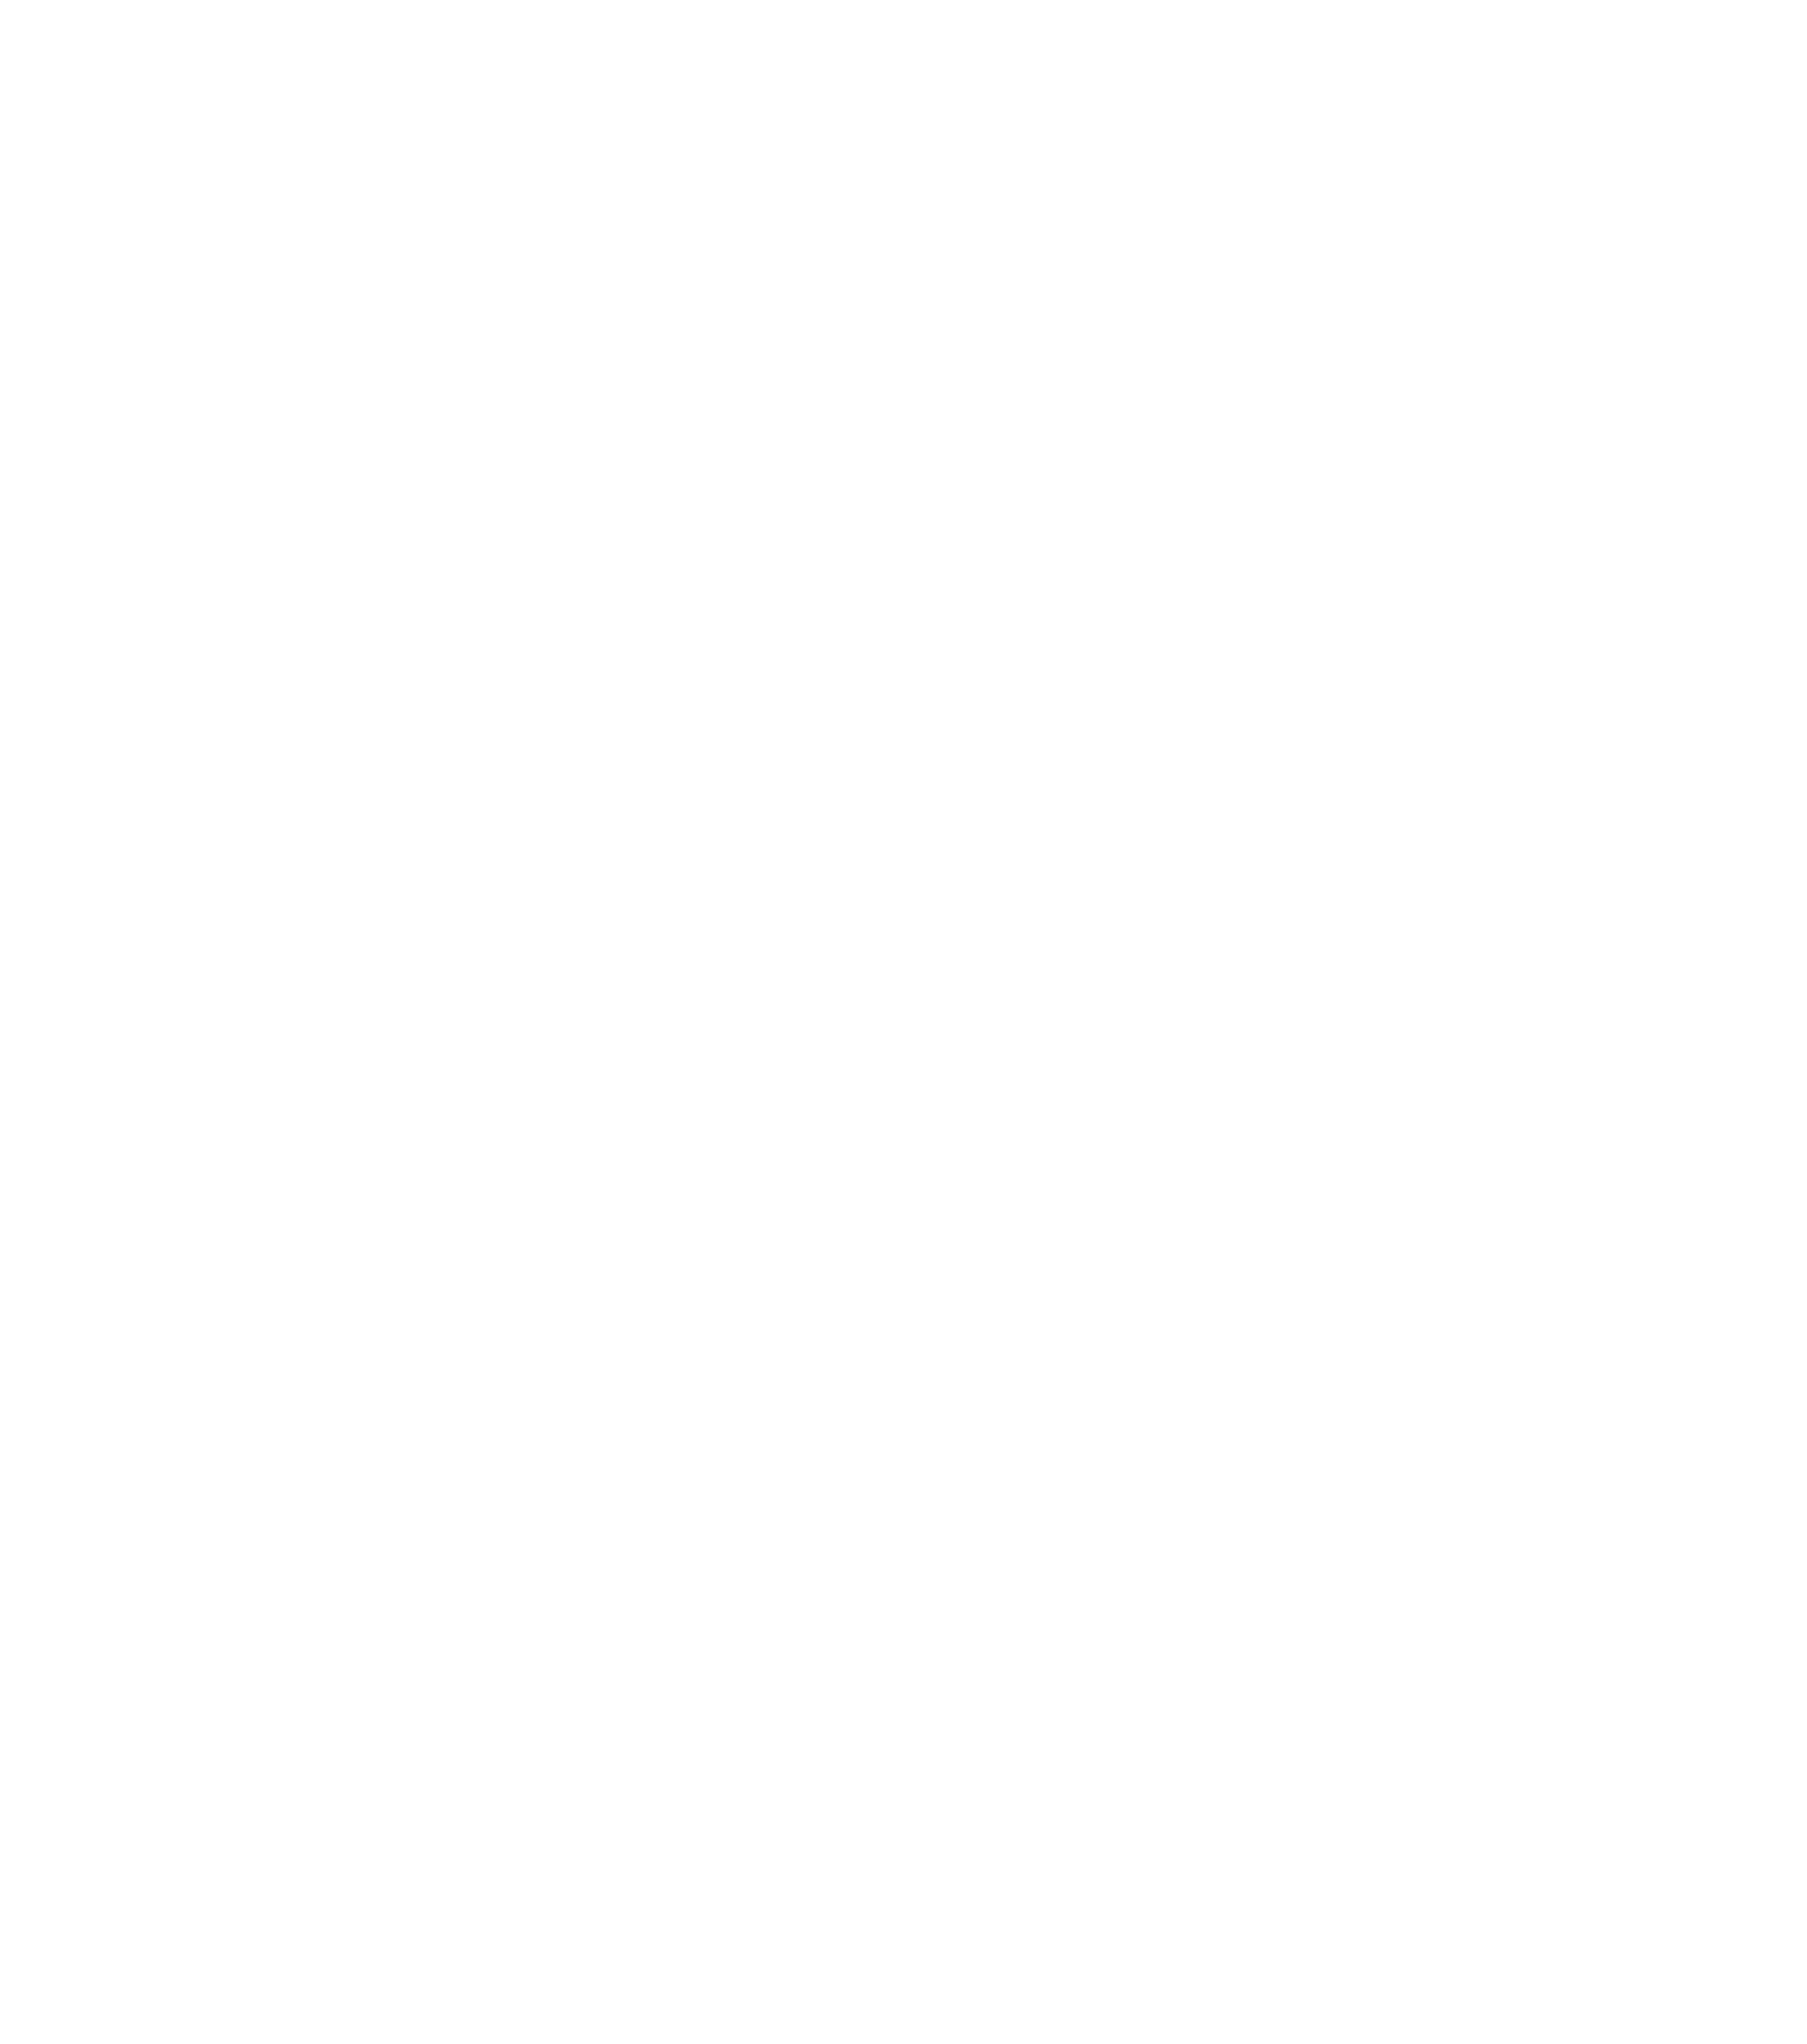 White Sherburne County logo